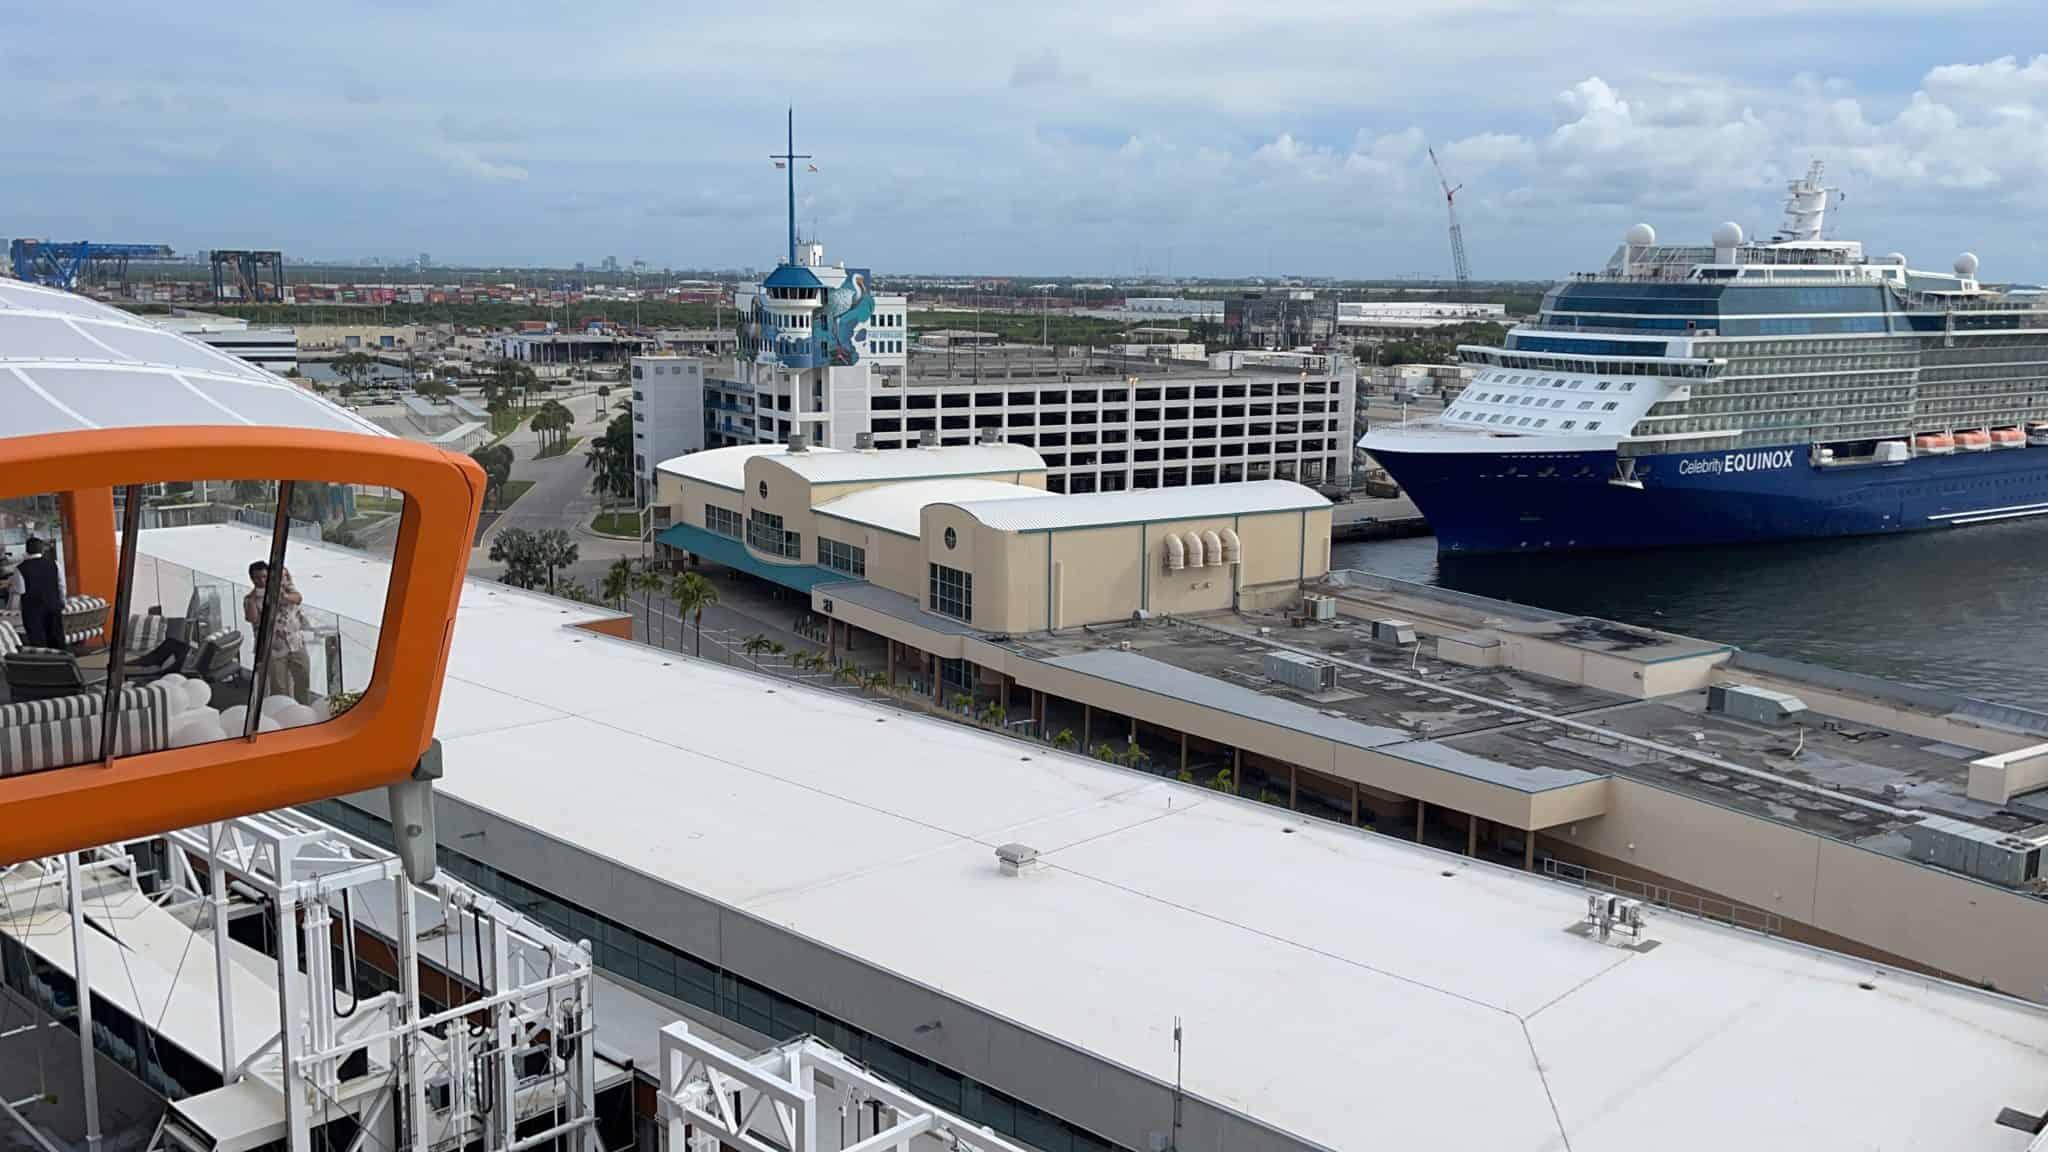 port everglades florida celebrity edge equinox